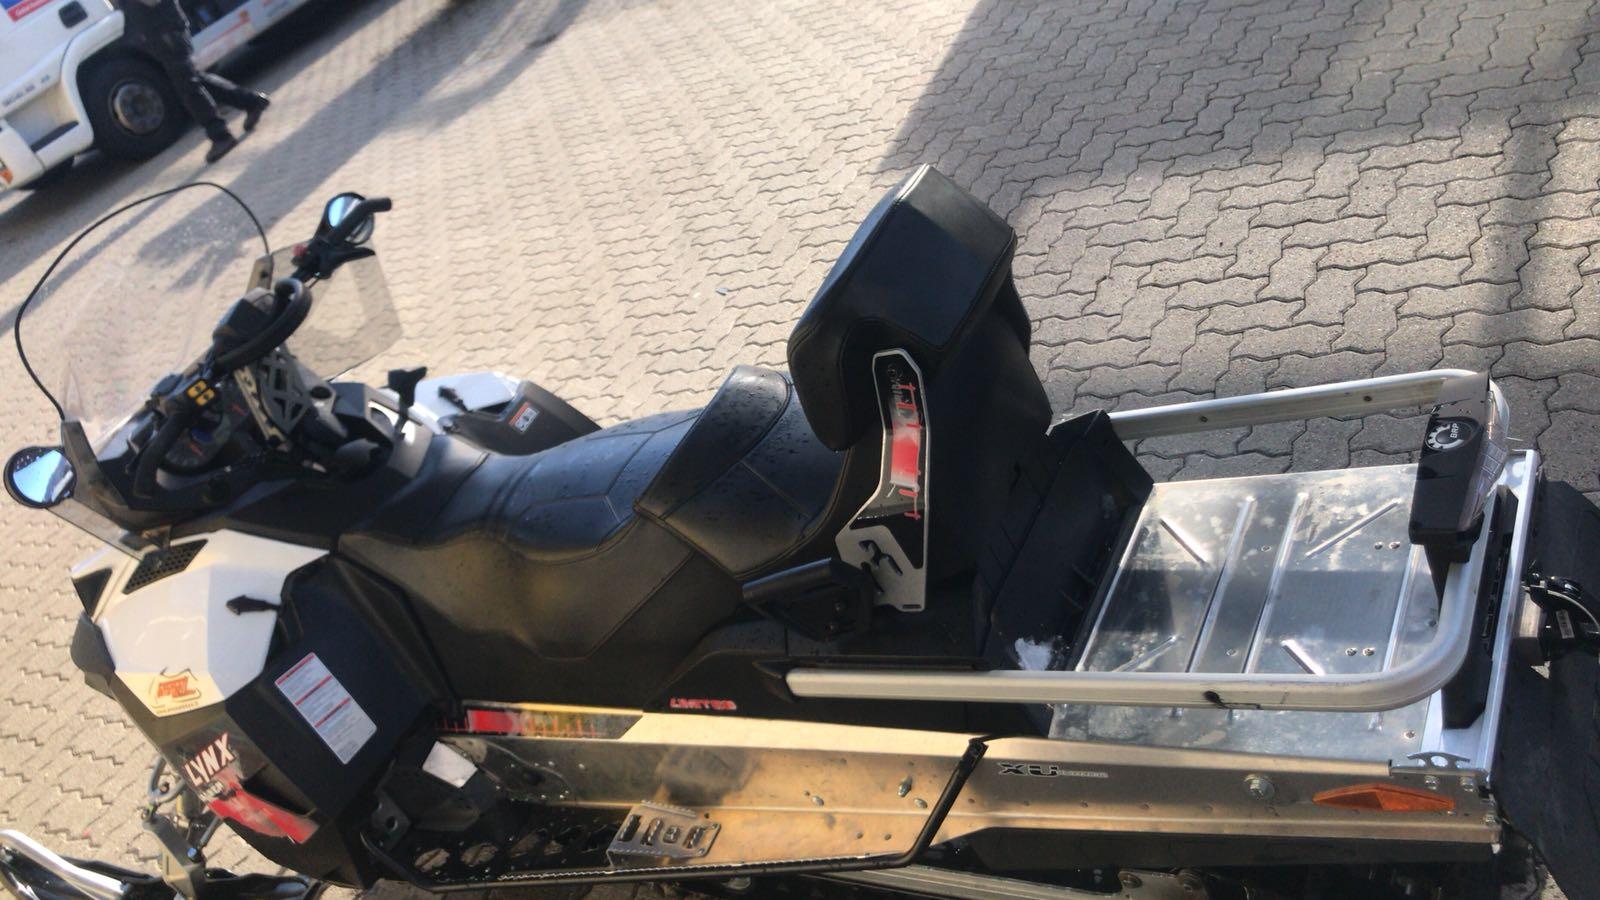 emmeti motoslitte usate susa brp lynx commander xtrim 600 e-tech 4